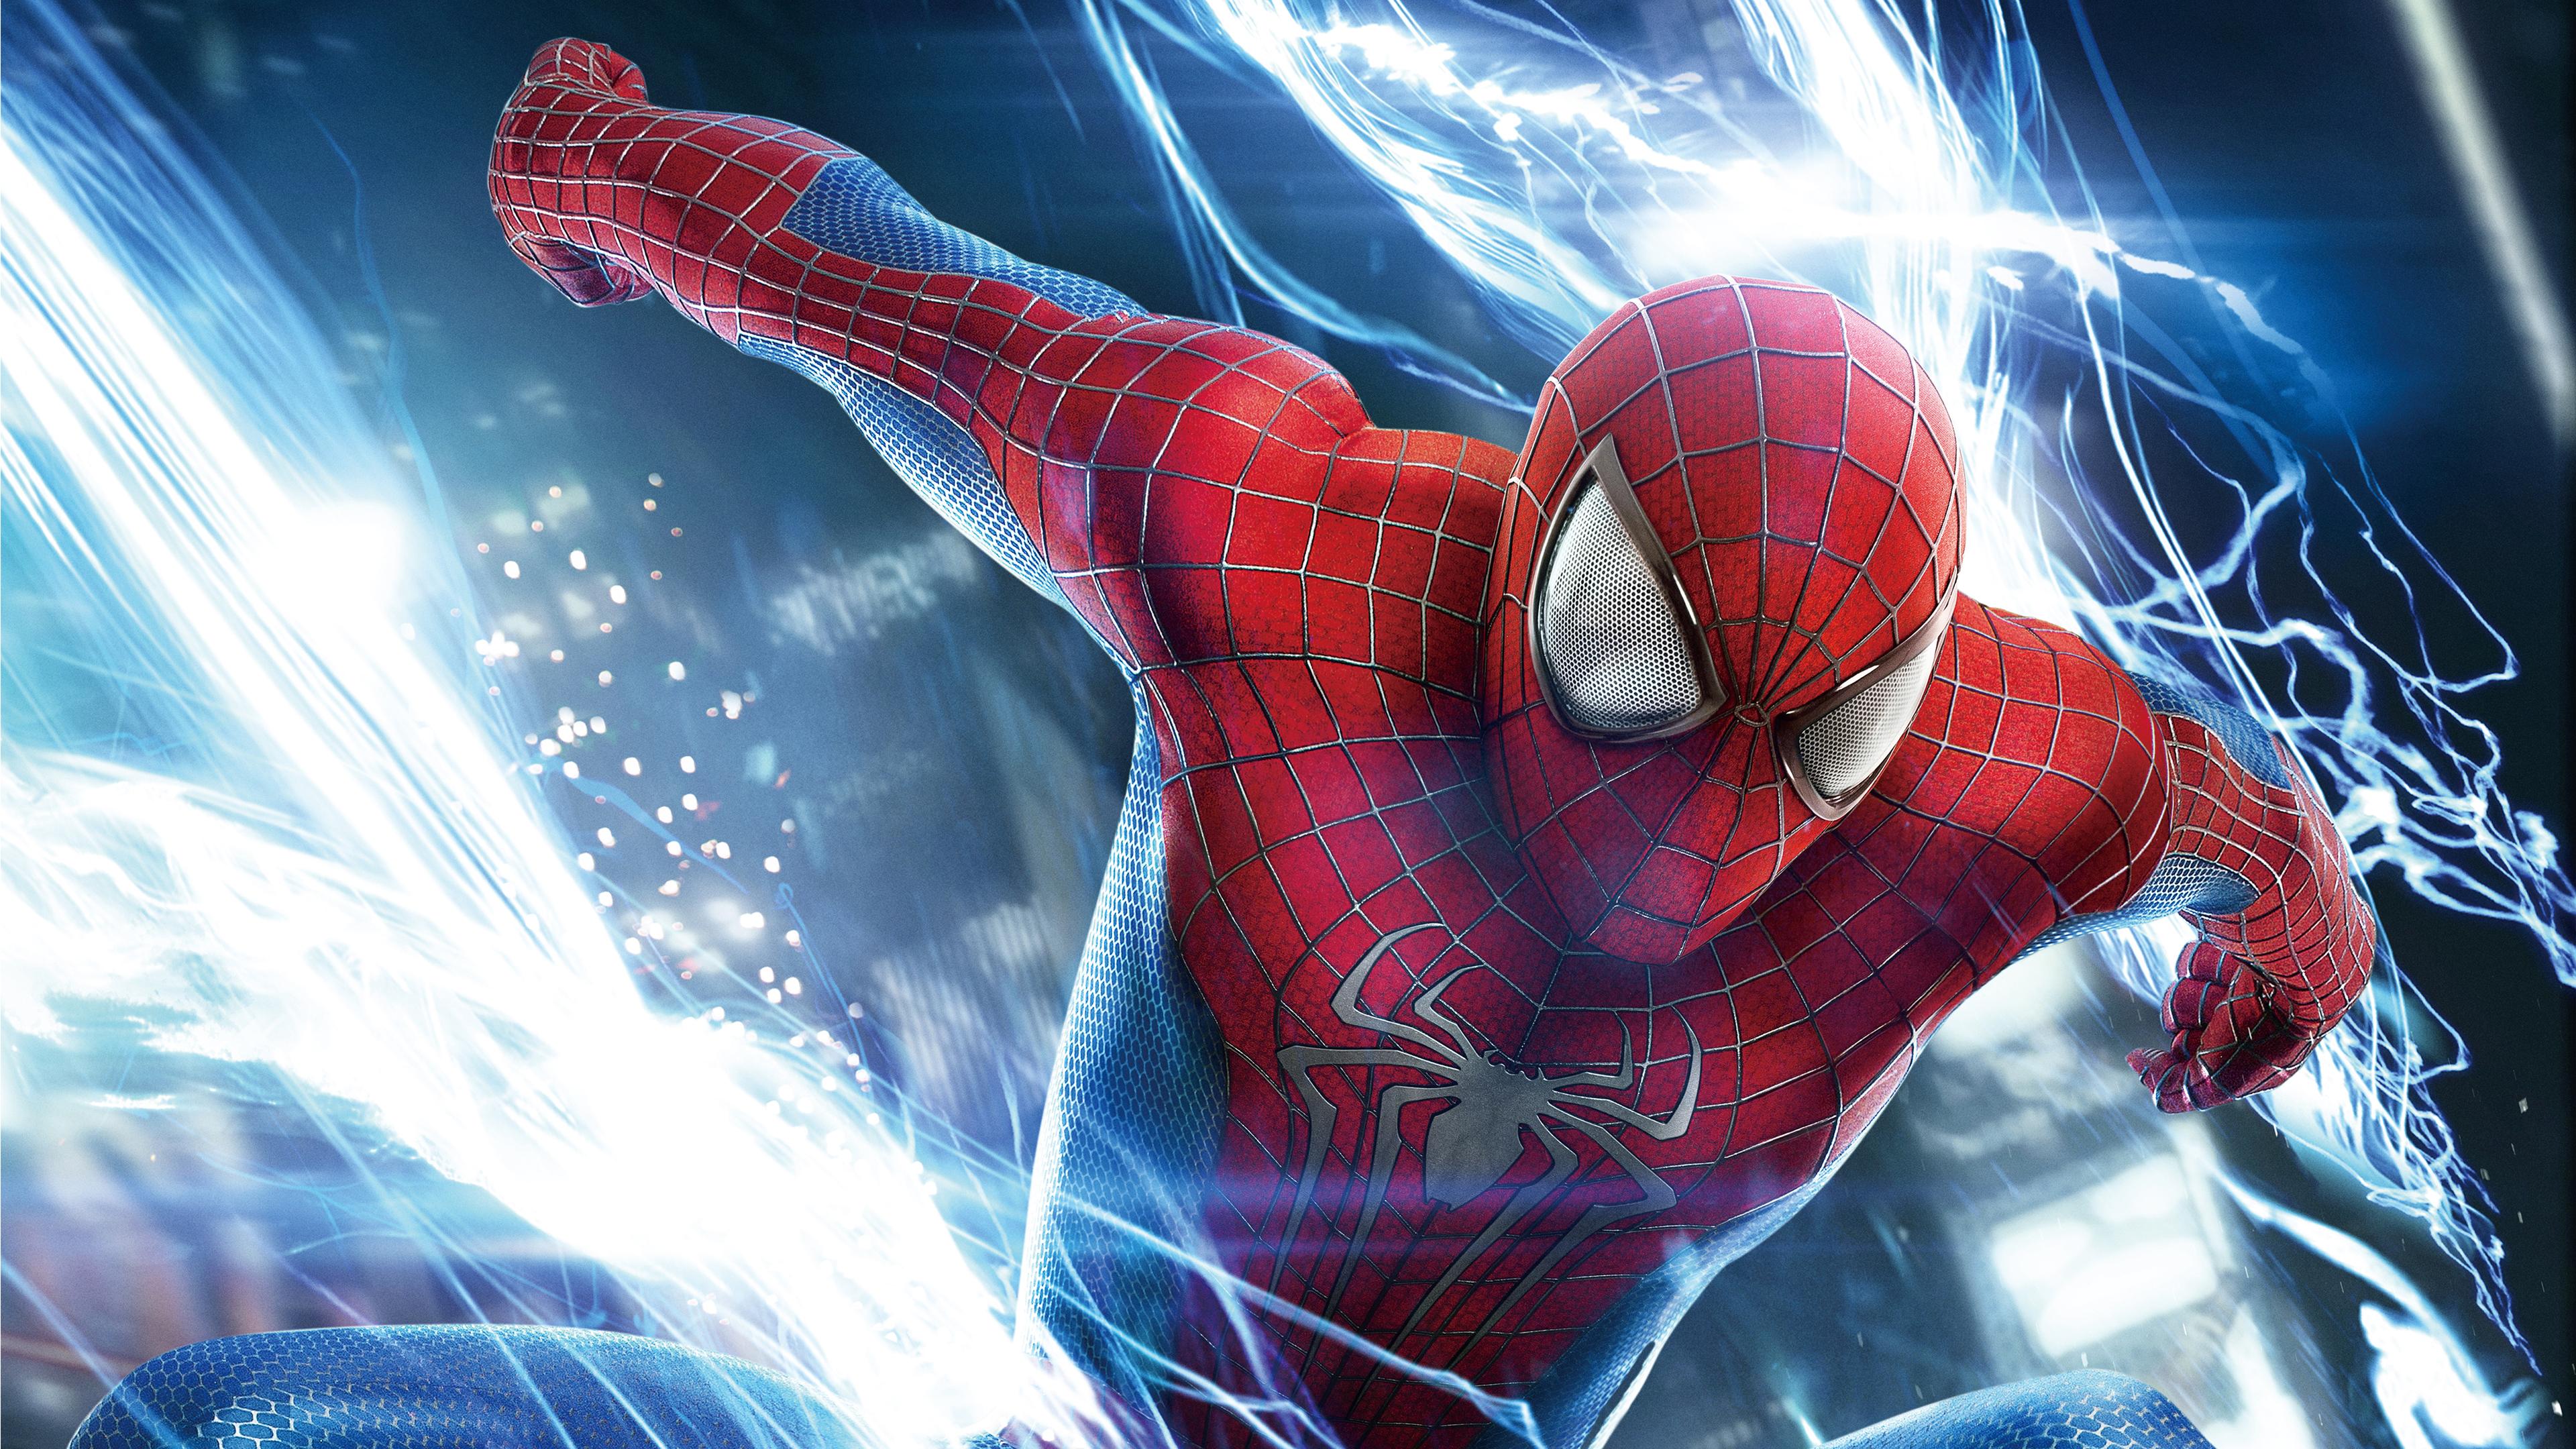 spiderman in action 1568055377 - Spiderman In Action - superheroes wallpapers, spiderman wallpapers, hd-wallpapers, 8k wallpapers, 5k wallpapers, 4k-wallpapers